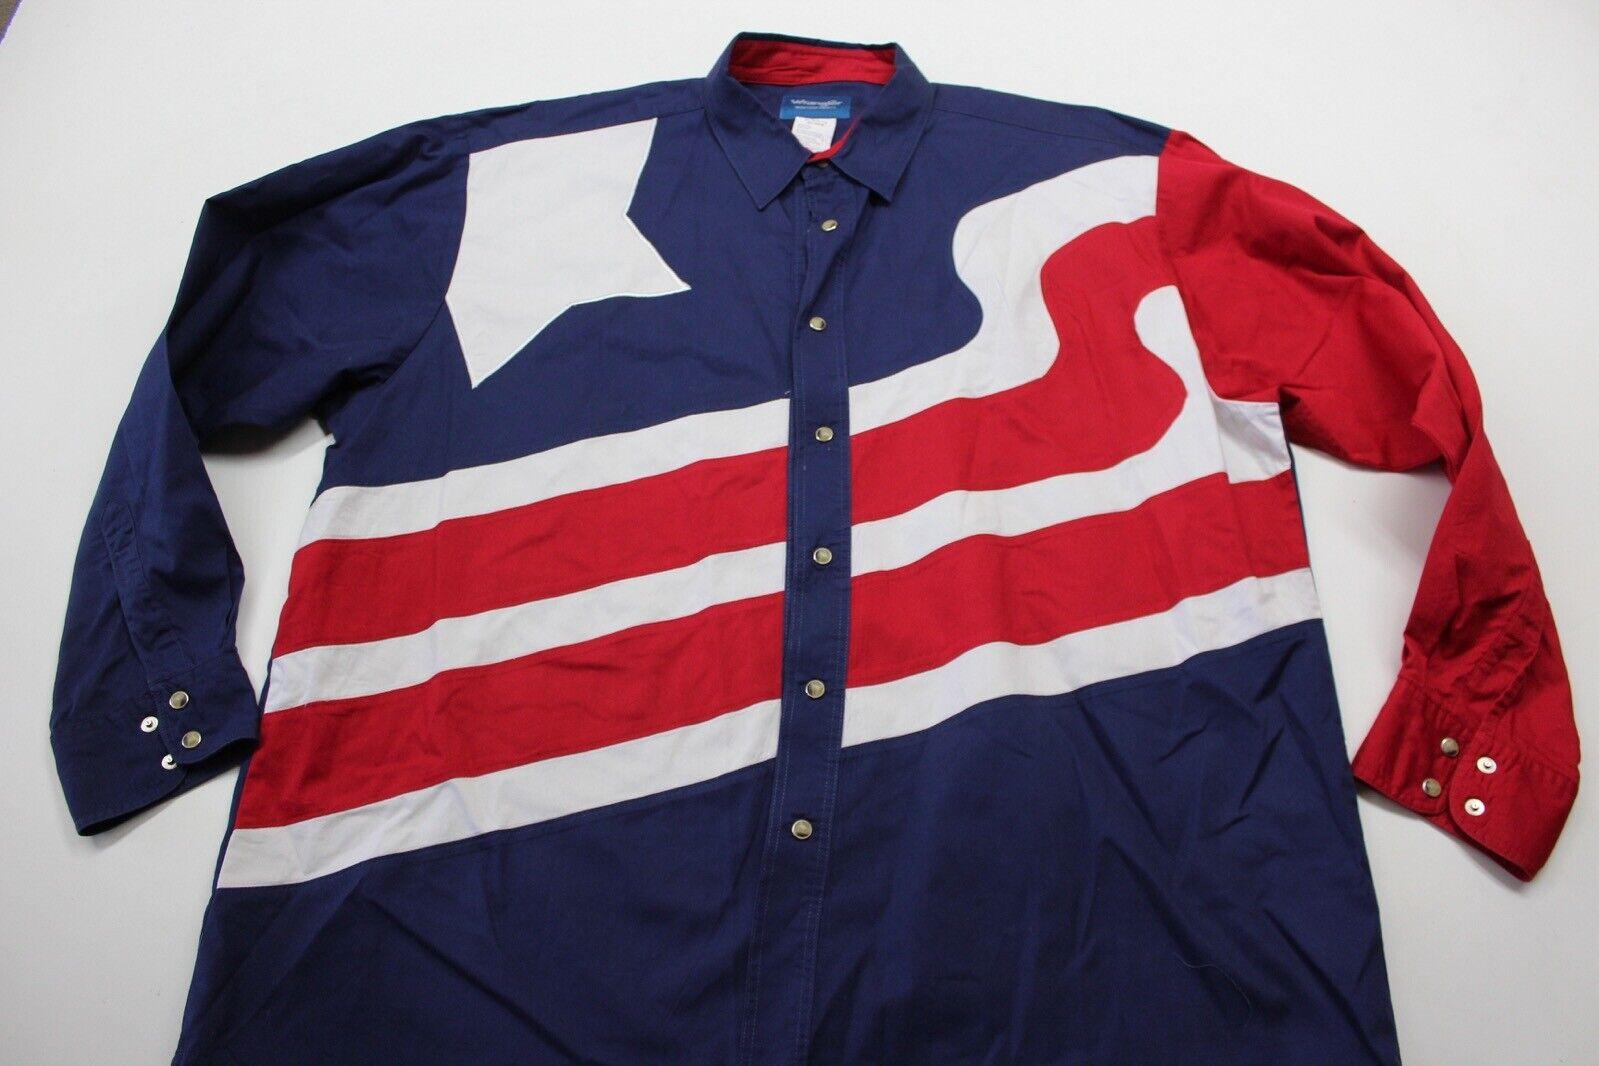 Wrangler USA State Flag Pearl Snap LONG SLEEVE SHIRT XL 17.5 x 36 37